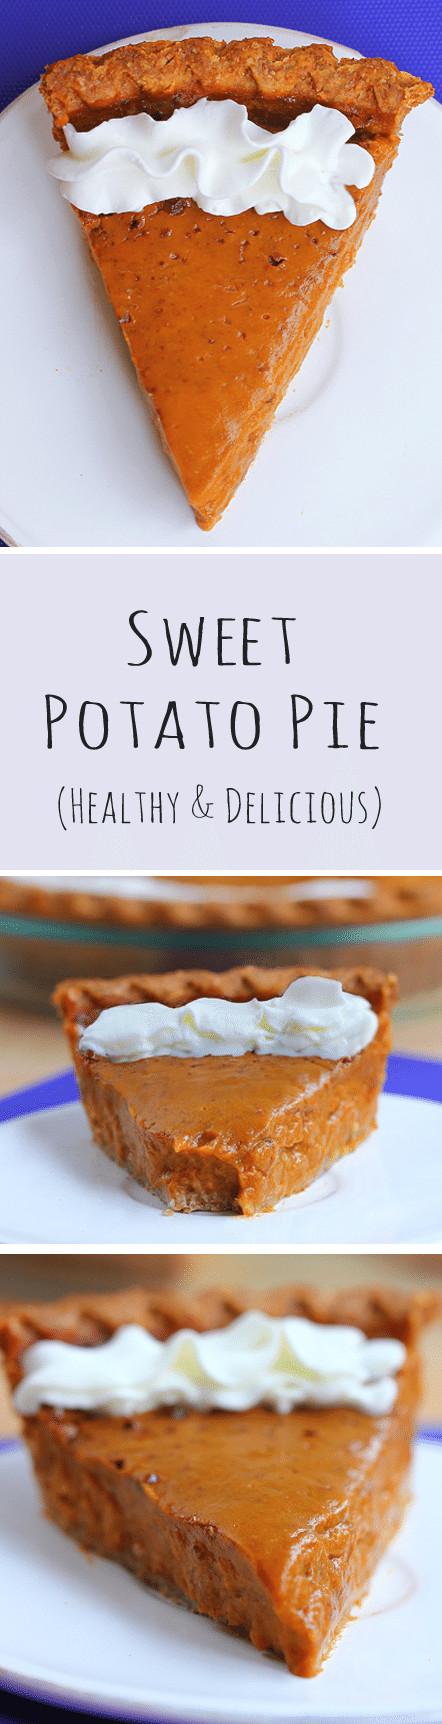 Healthy Shepherd'S Pie Recipe With Sweet Potato  Healthy Sweet Potato Pie with homemade pie crust